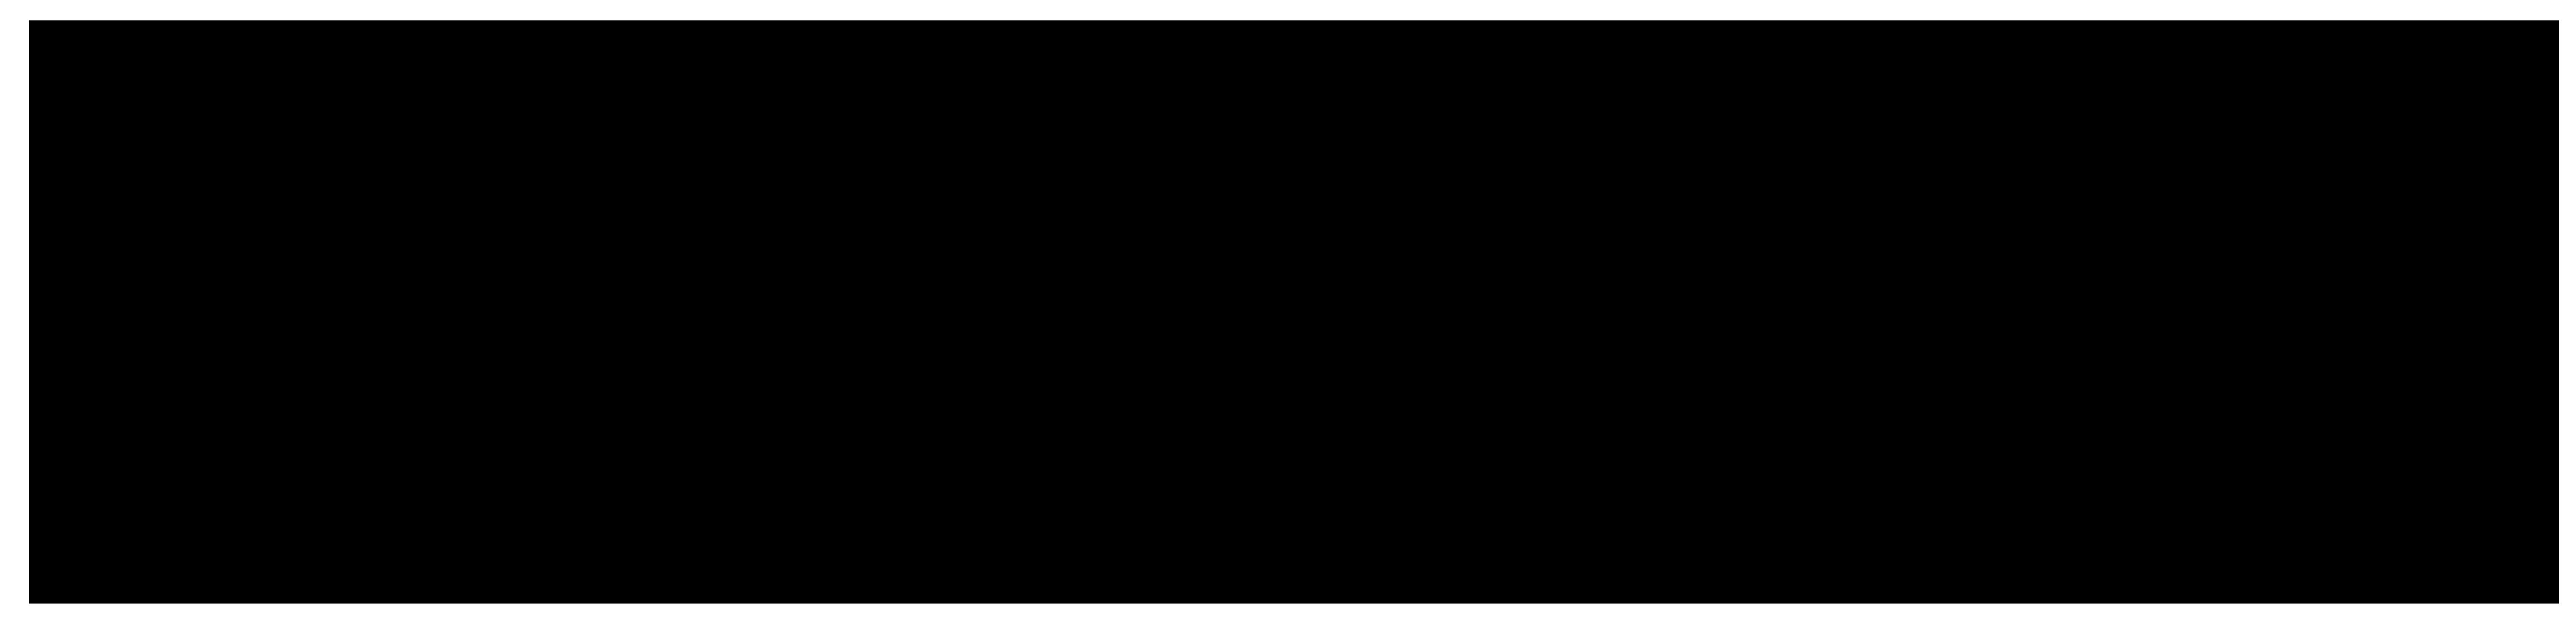 Counter-Strike Logo Wallpaper